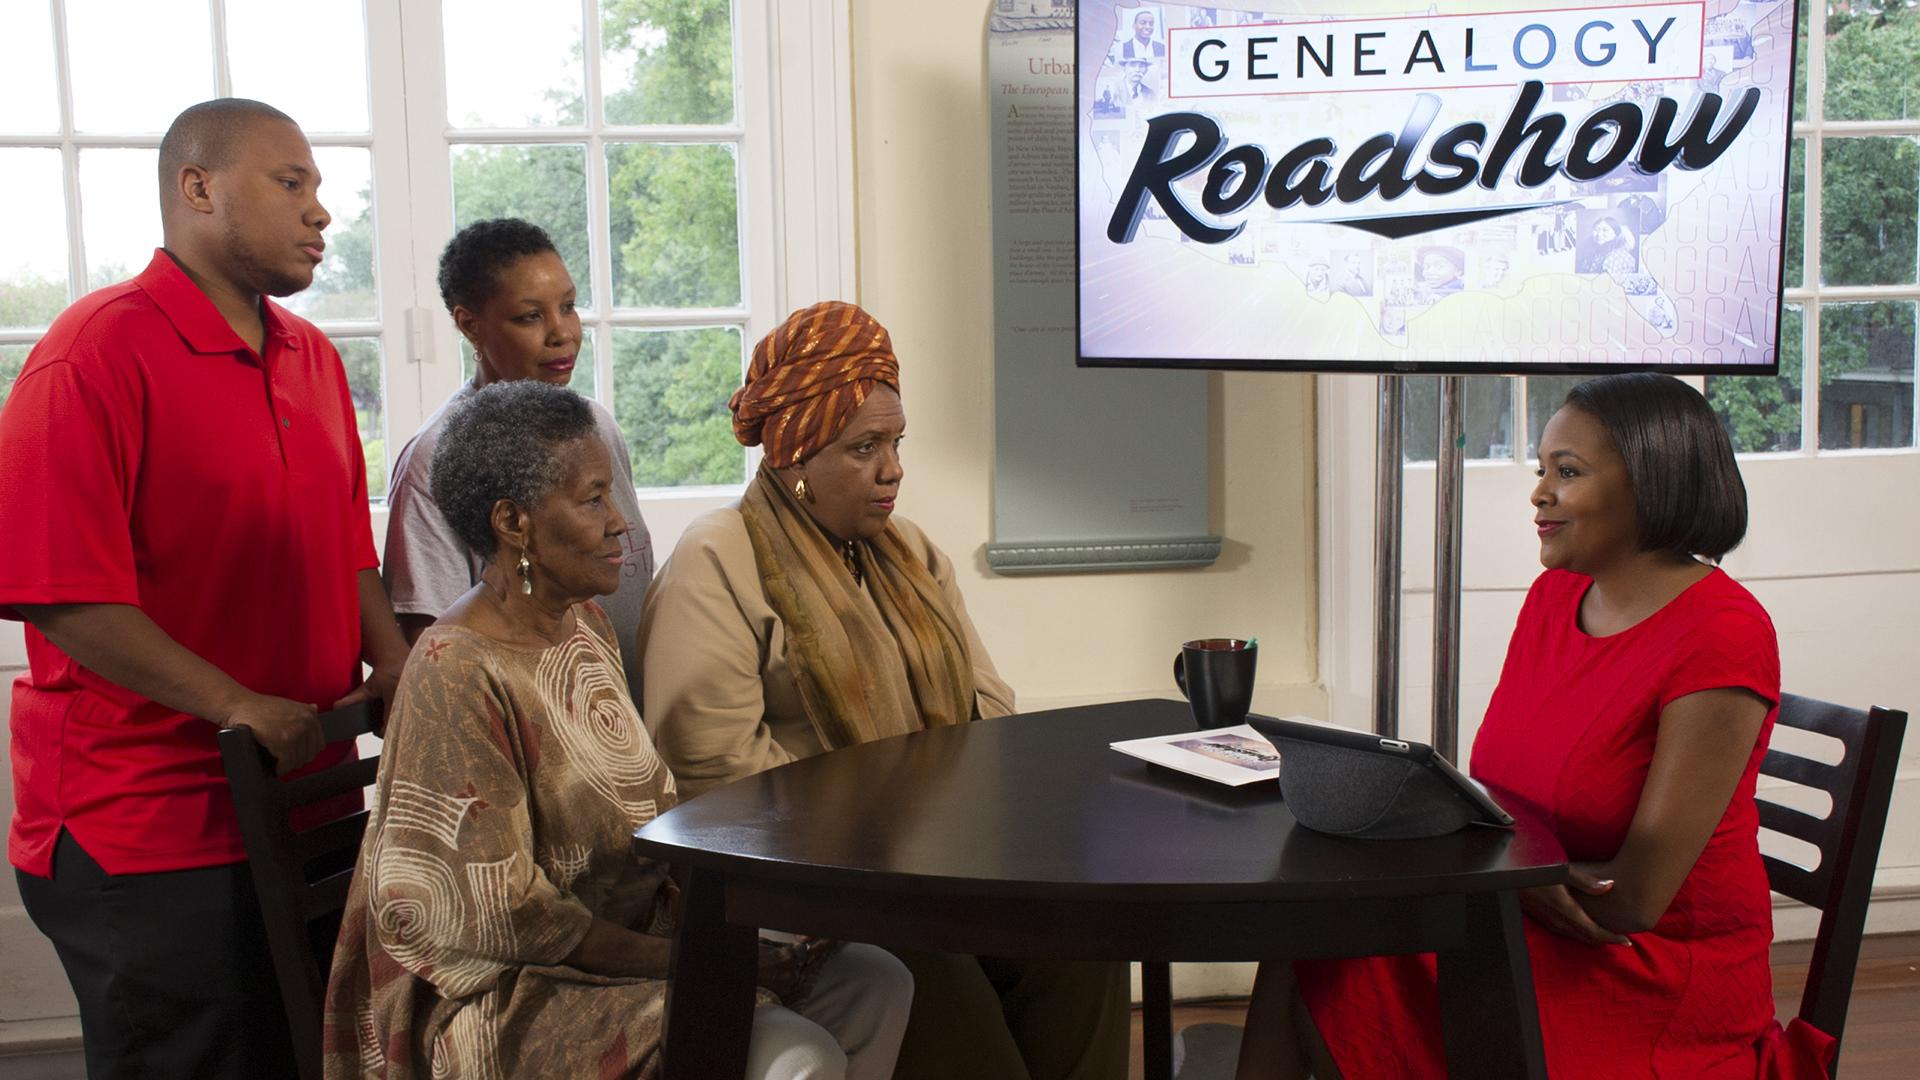 A scene from Genealogy Roadshow with Kenyatta D. Berry.